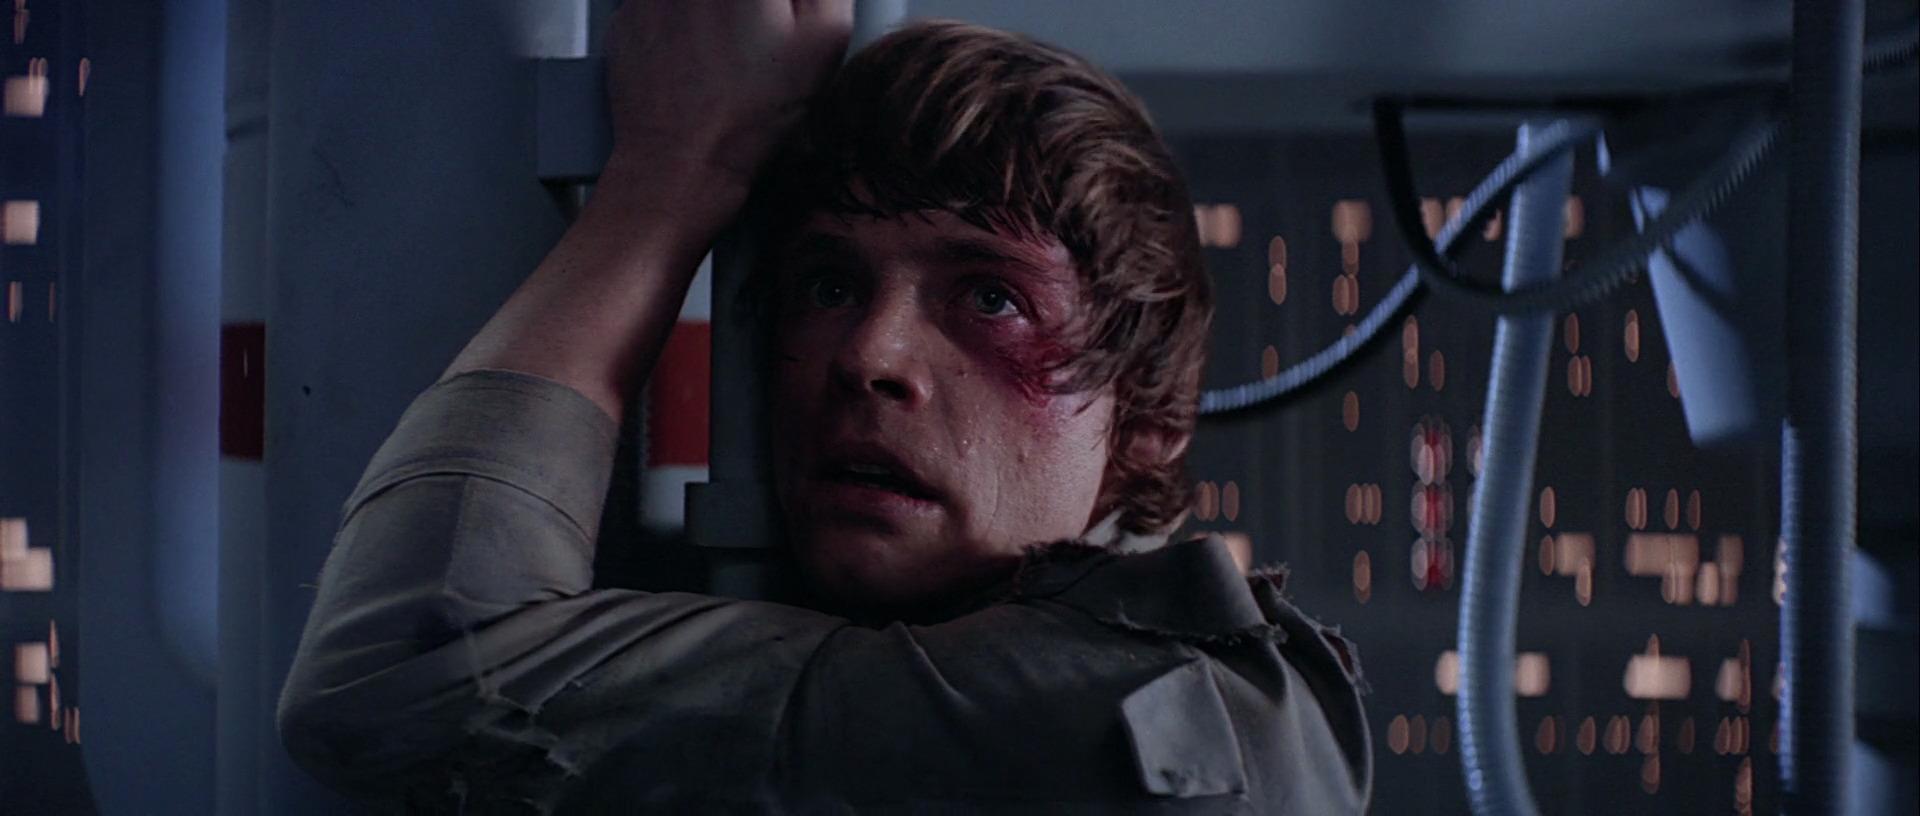 Luke_Skywalker's_realization_of_Darth_Vader_being_his_father.jpg